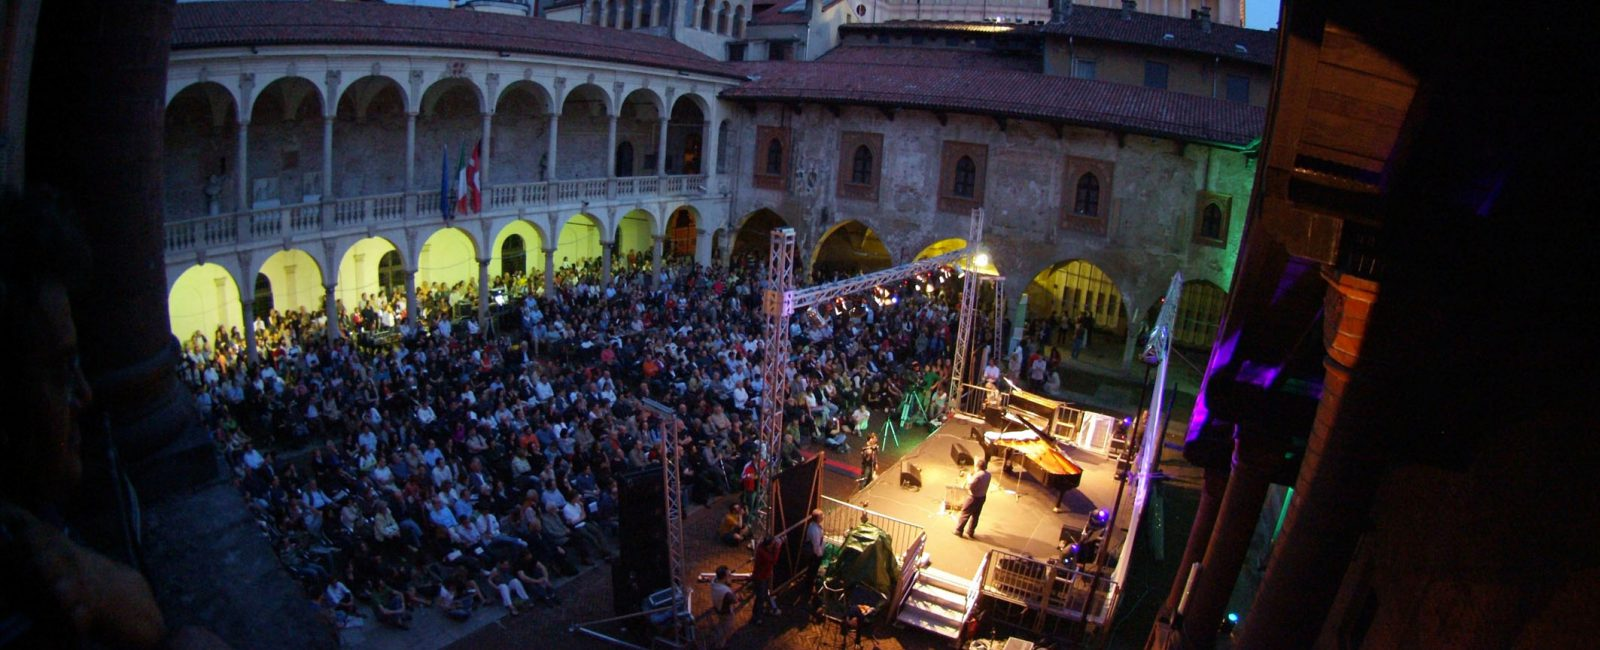 Novara-Jazz-Cortile-del-Broletto-Roberto-Cifarelli-1600x650.jpg